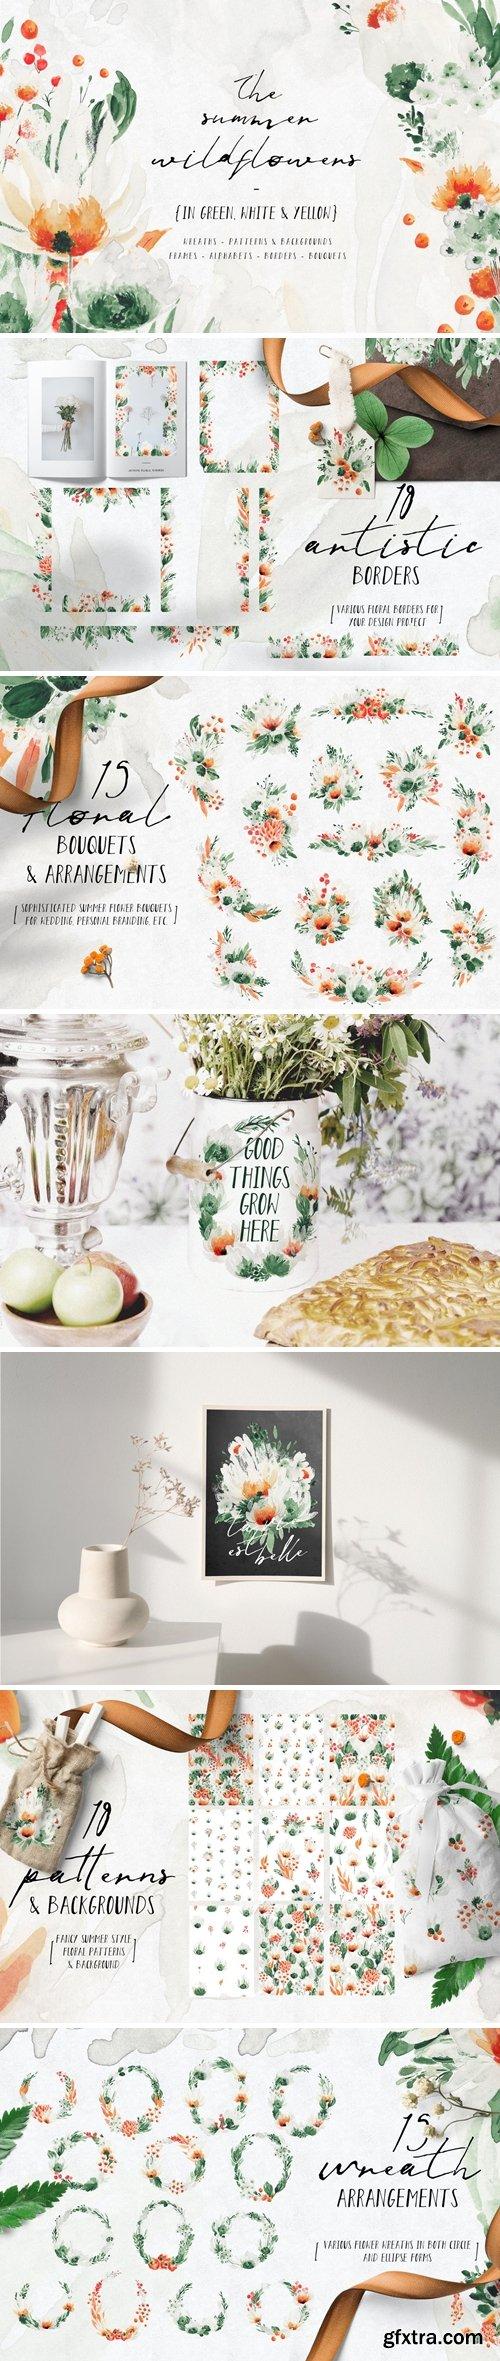 Summer Wildflowers Illustration Pack